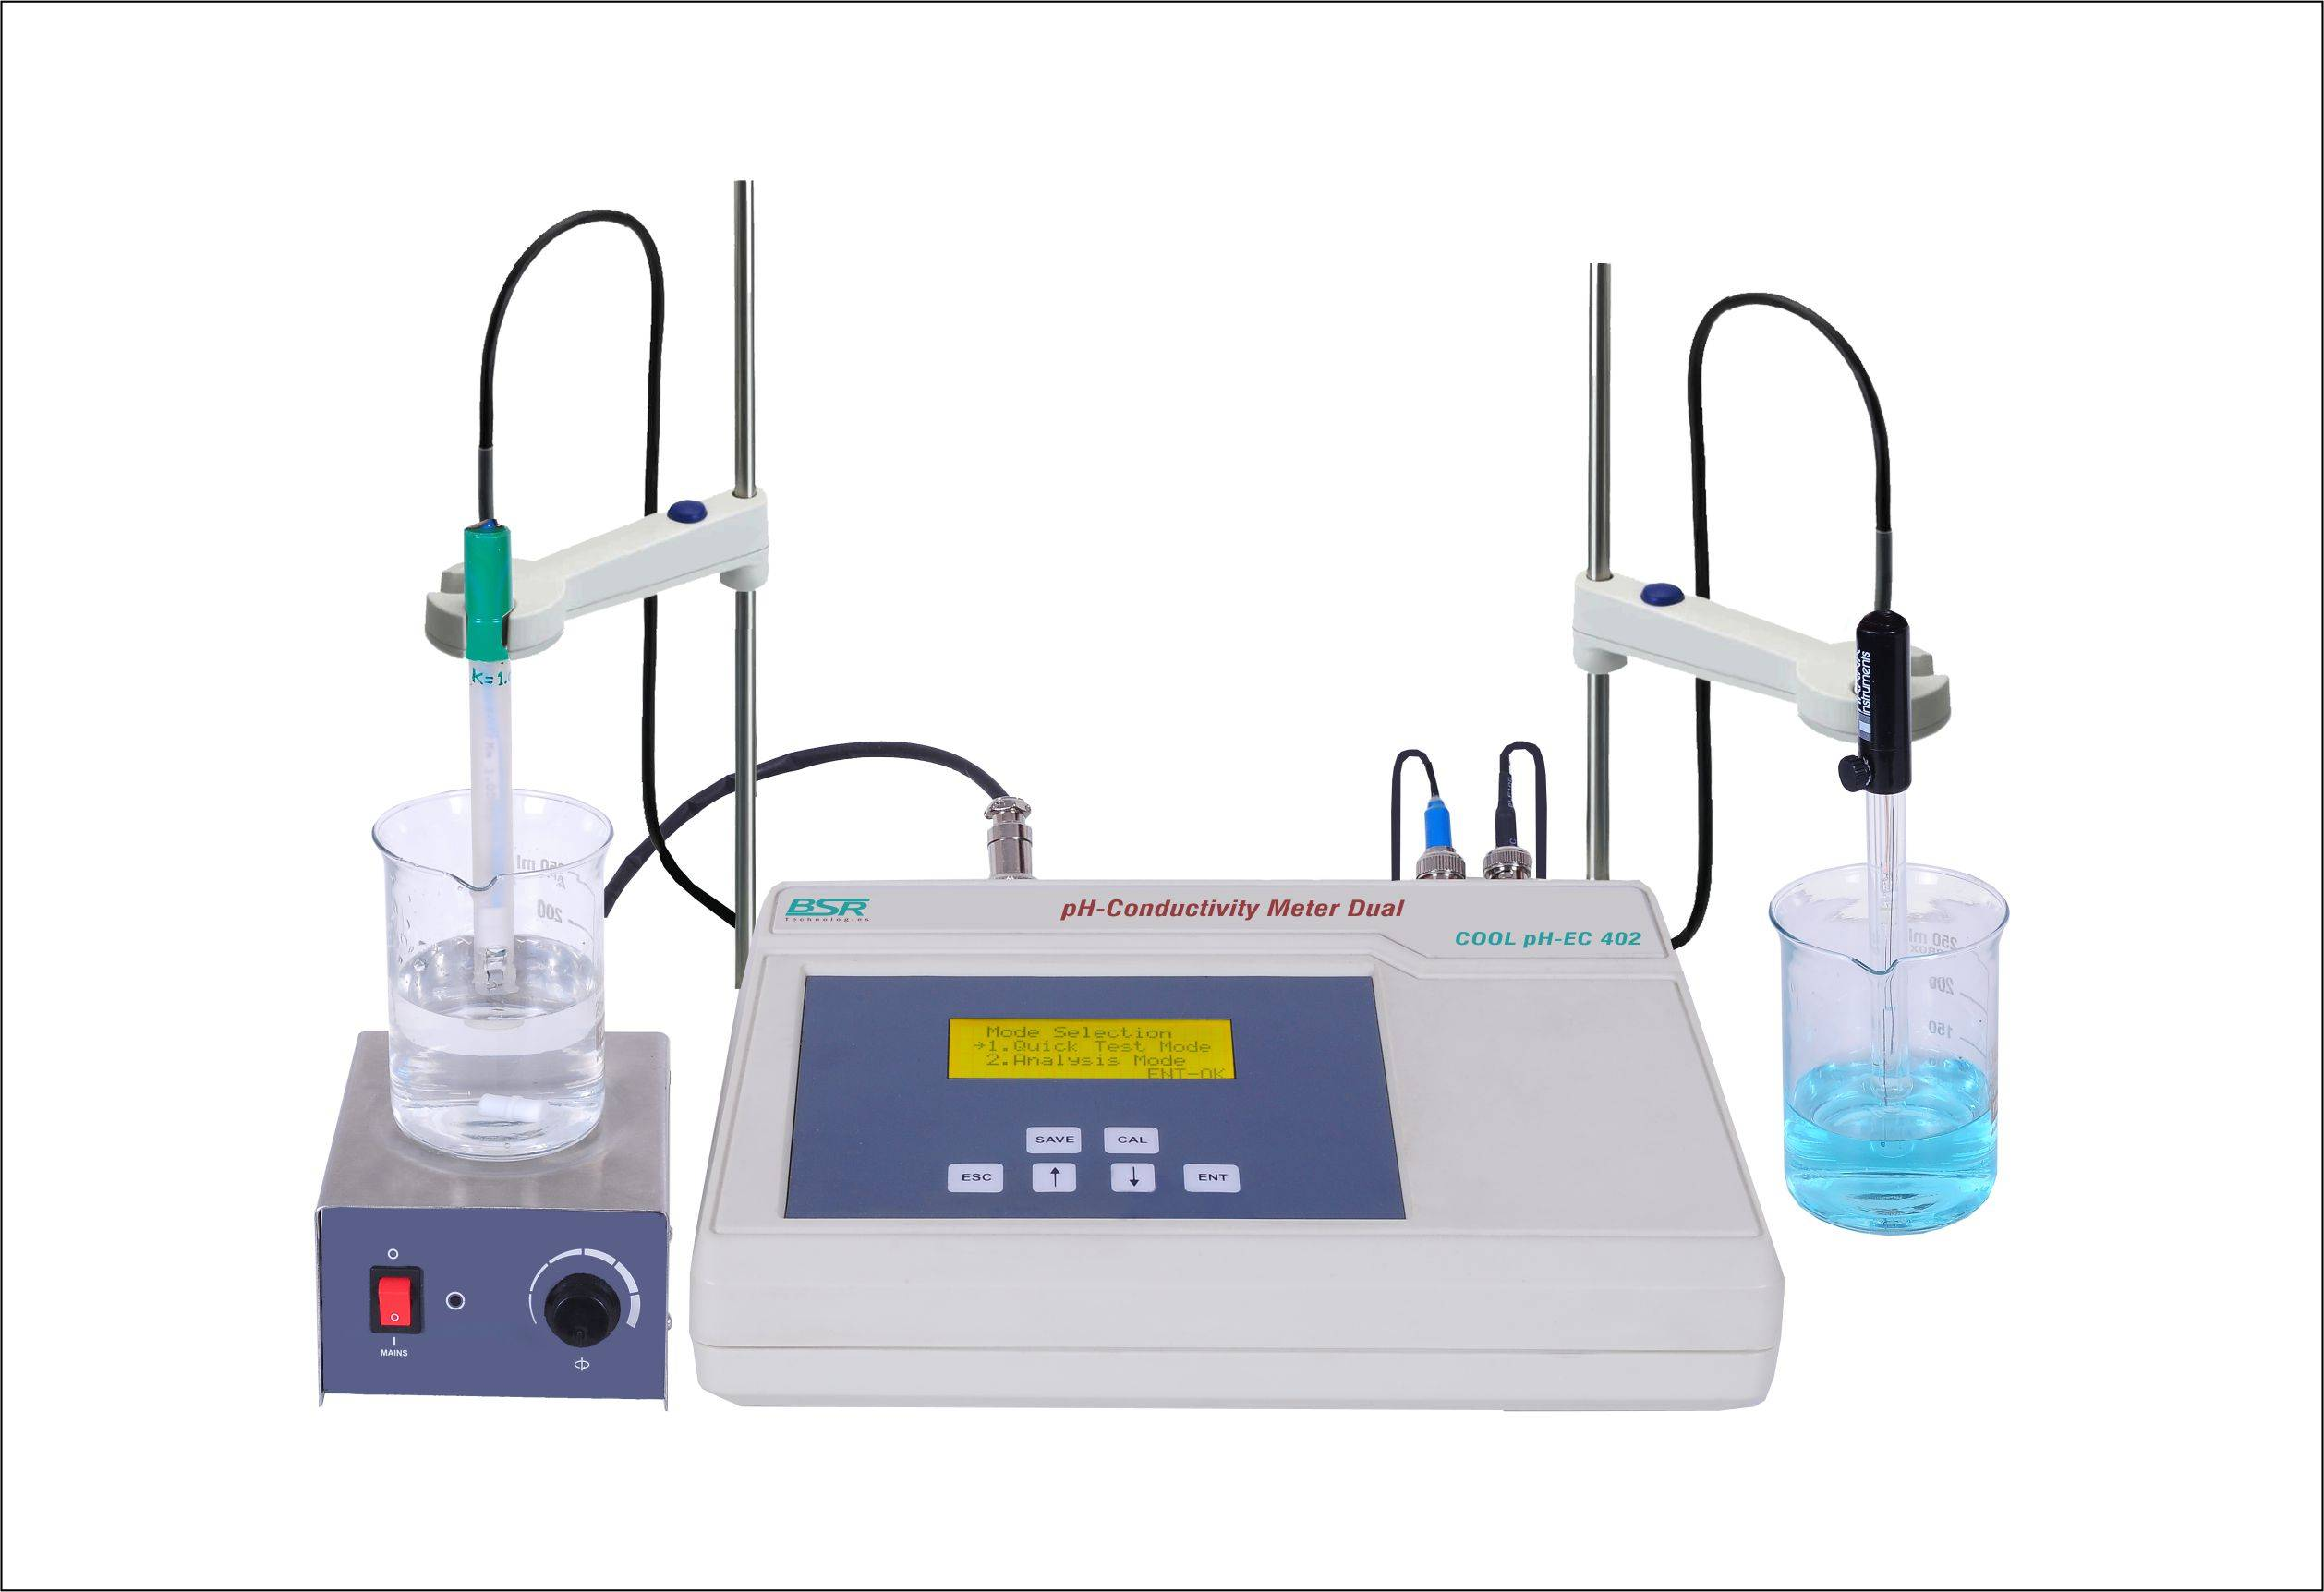 pH-Conductivity Meter Dual